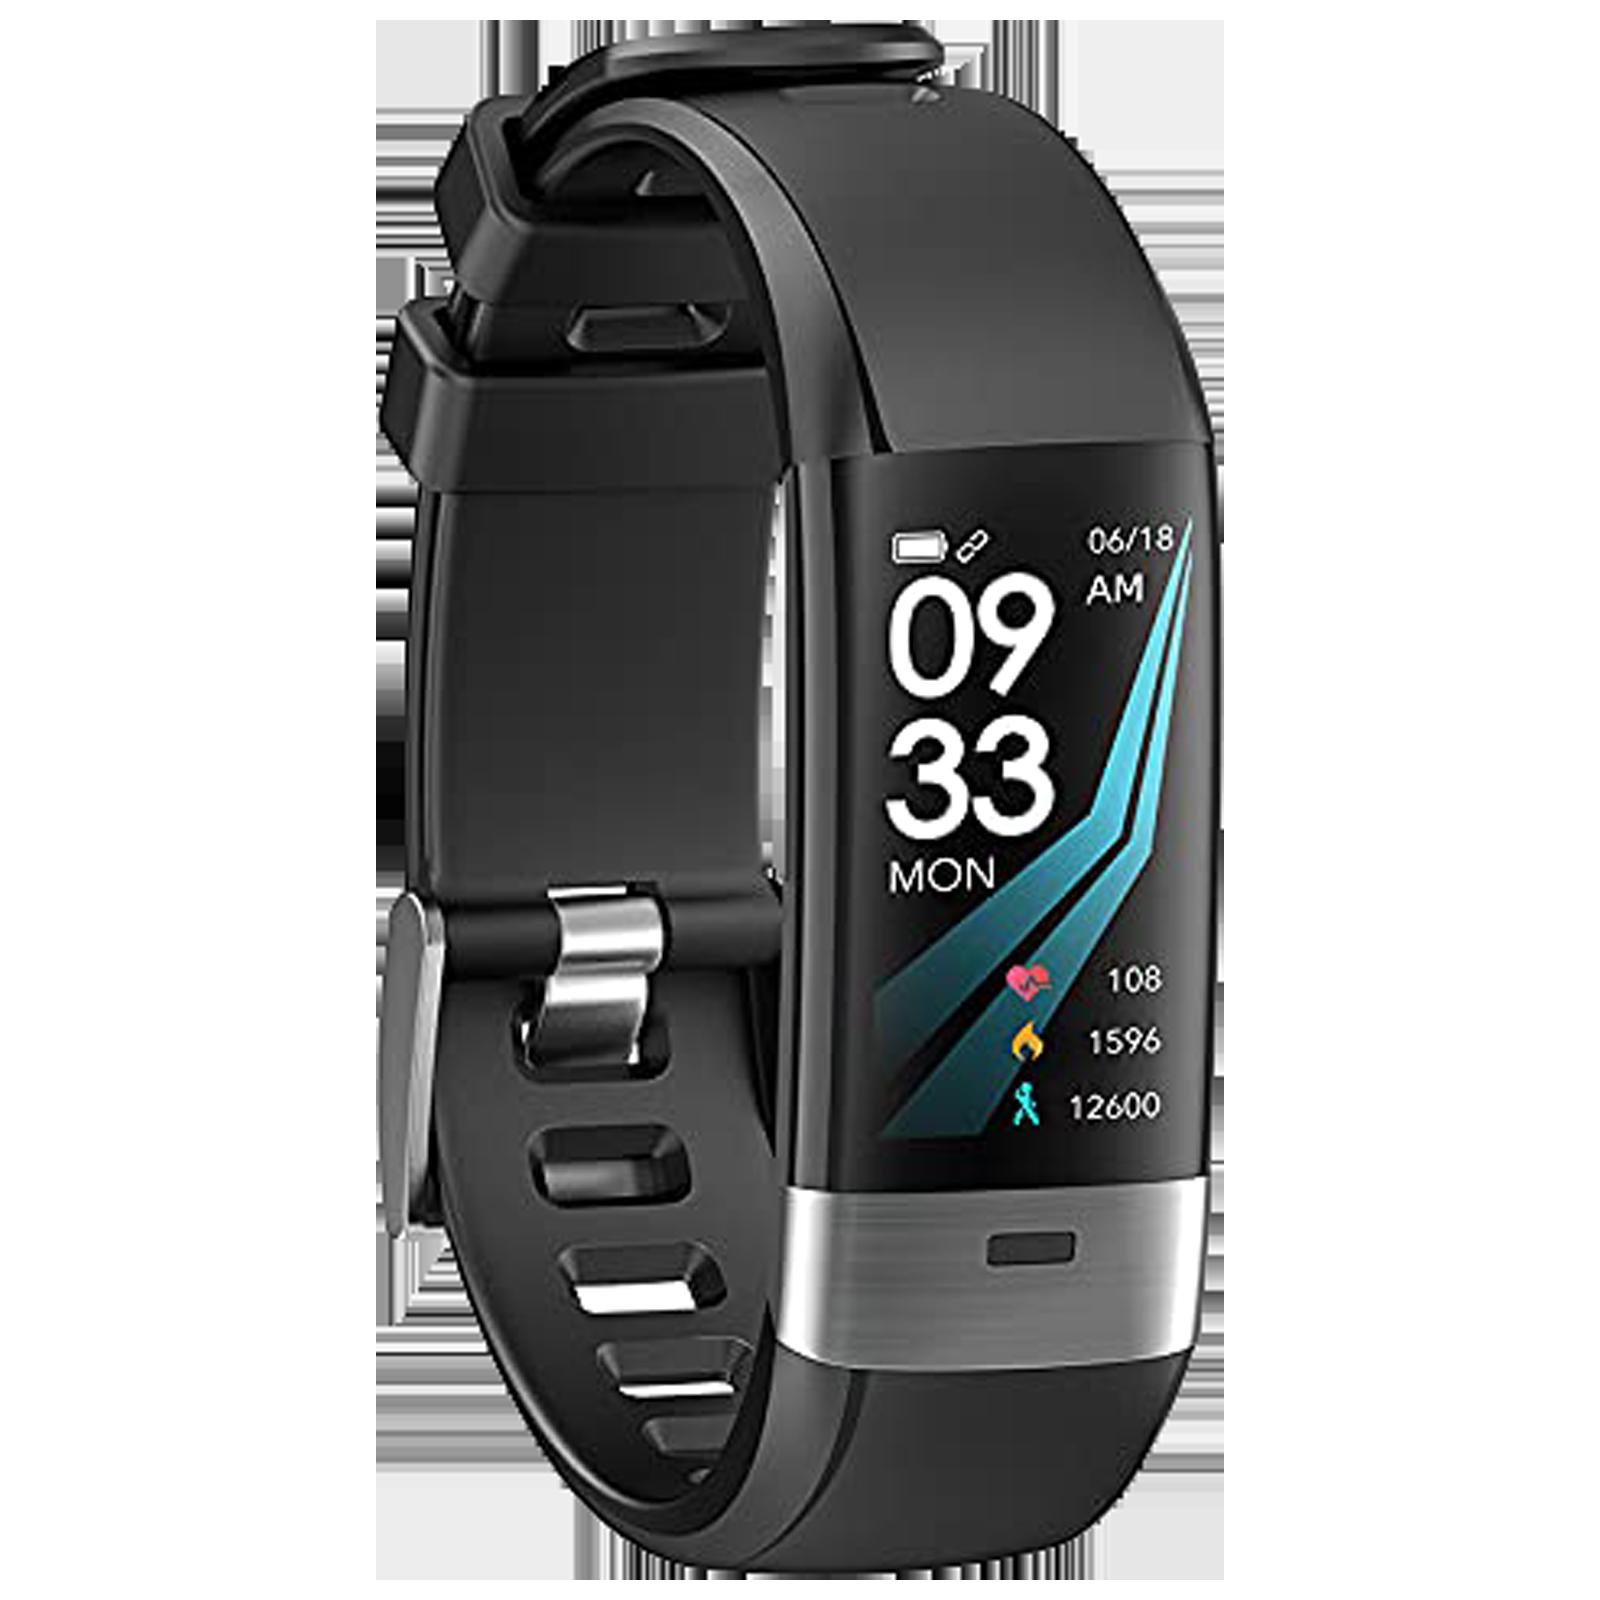 eOnz North Edge Balance 36 Smart Band (24.38mm) (Heart Rate Monitoring, Black, TPU Band)_1